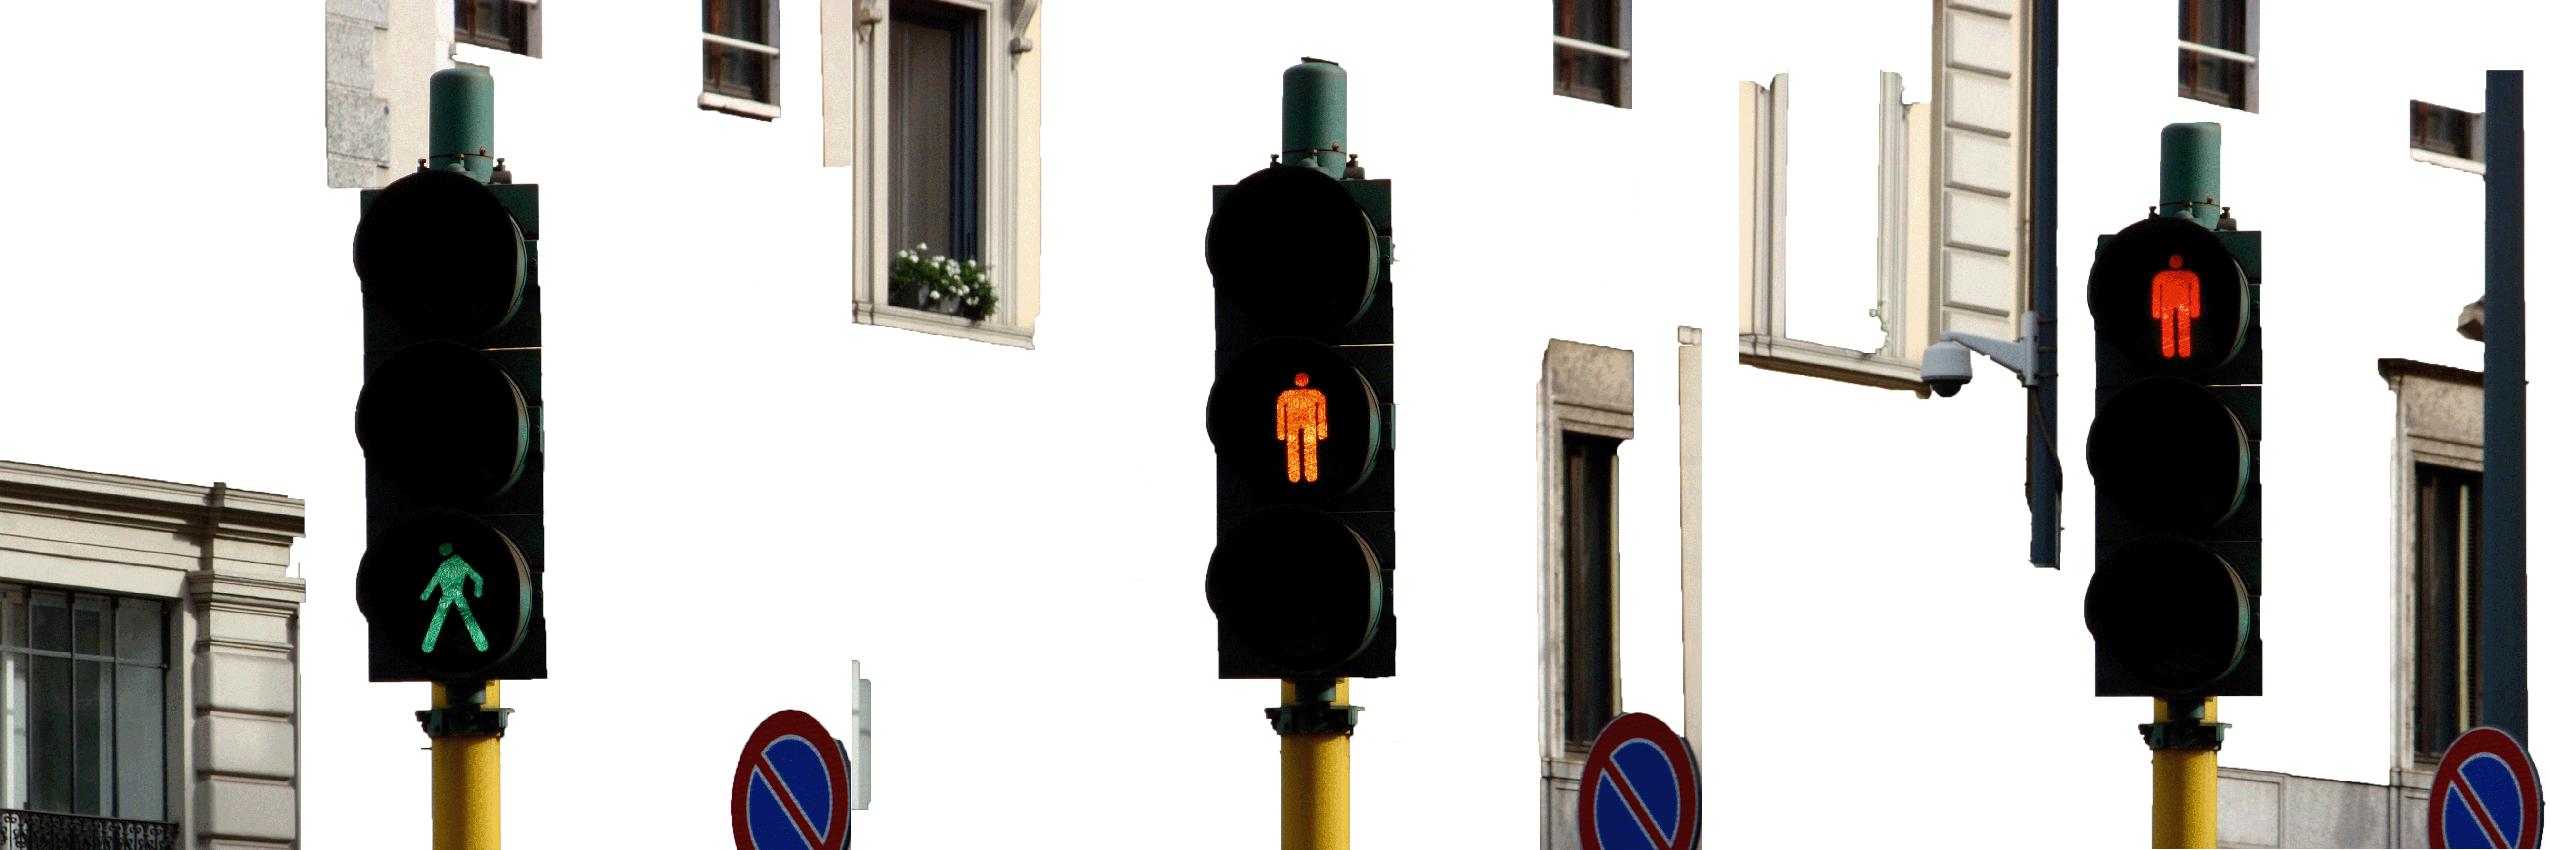 italian street light (Three in Three) by Batsceba